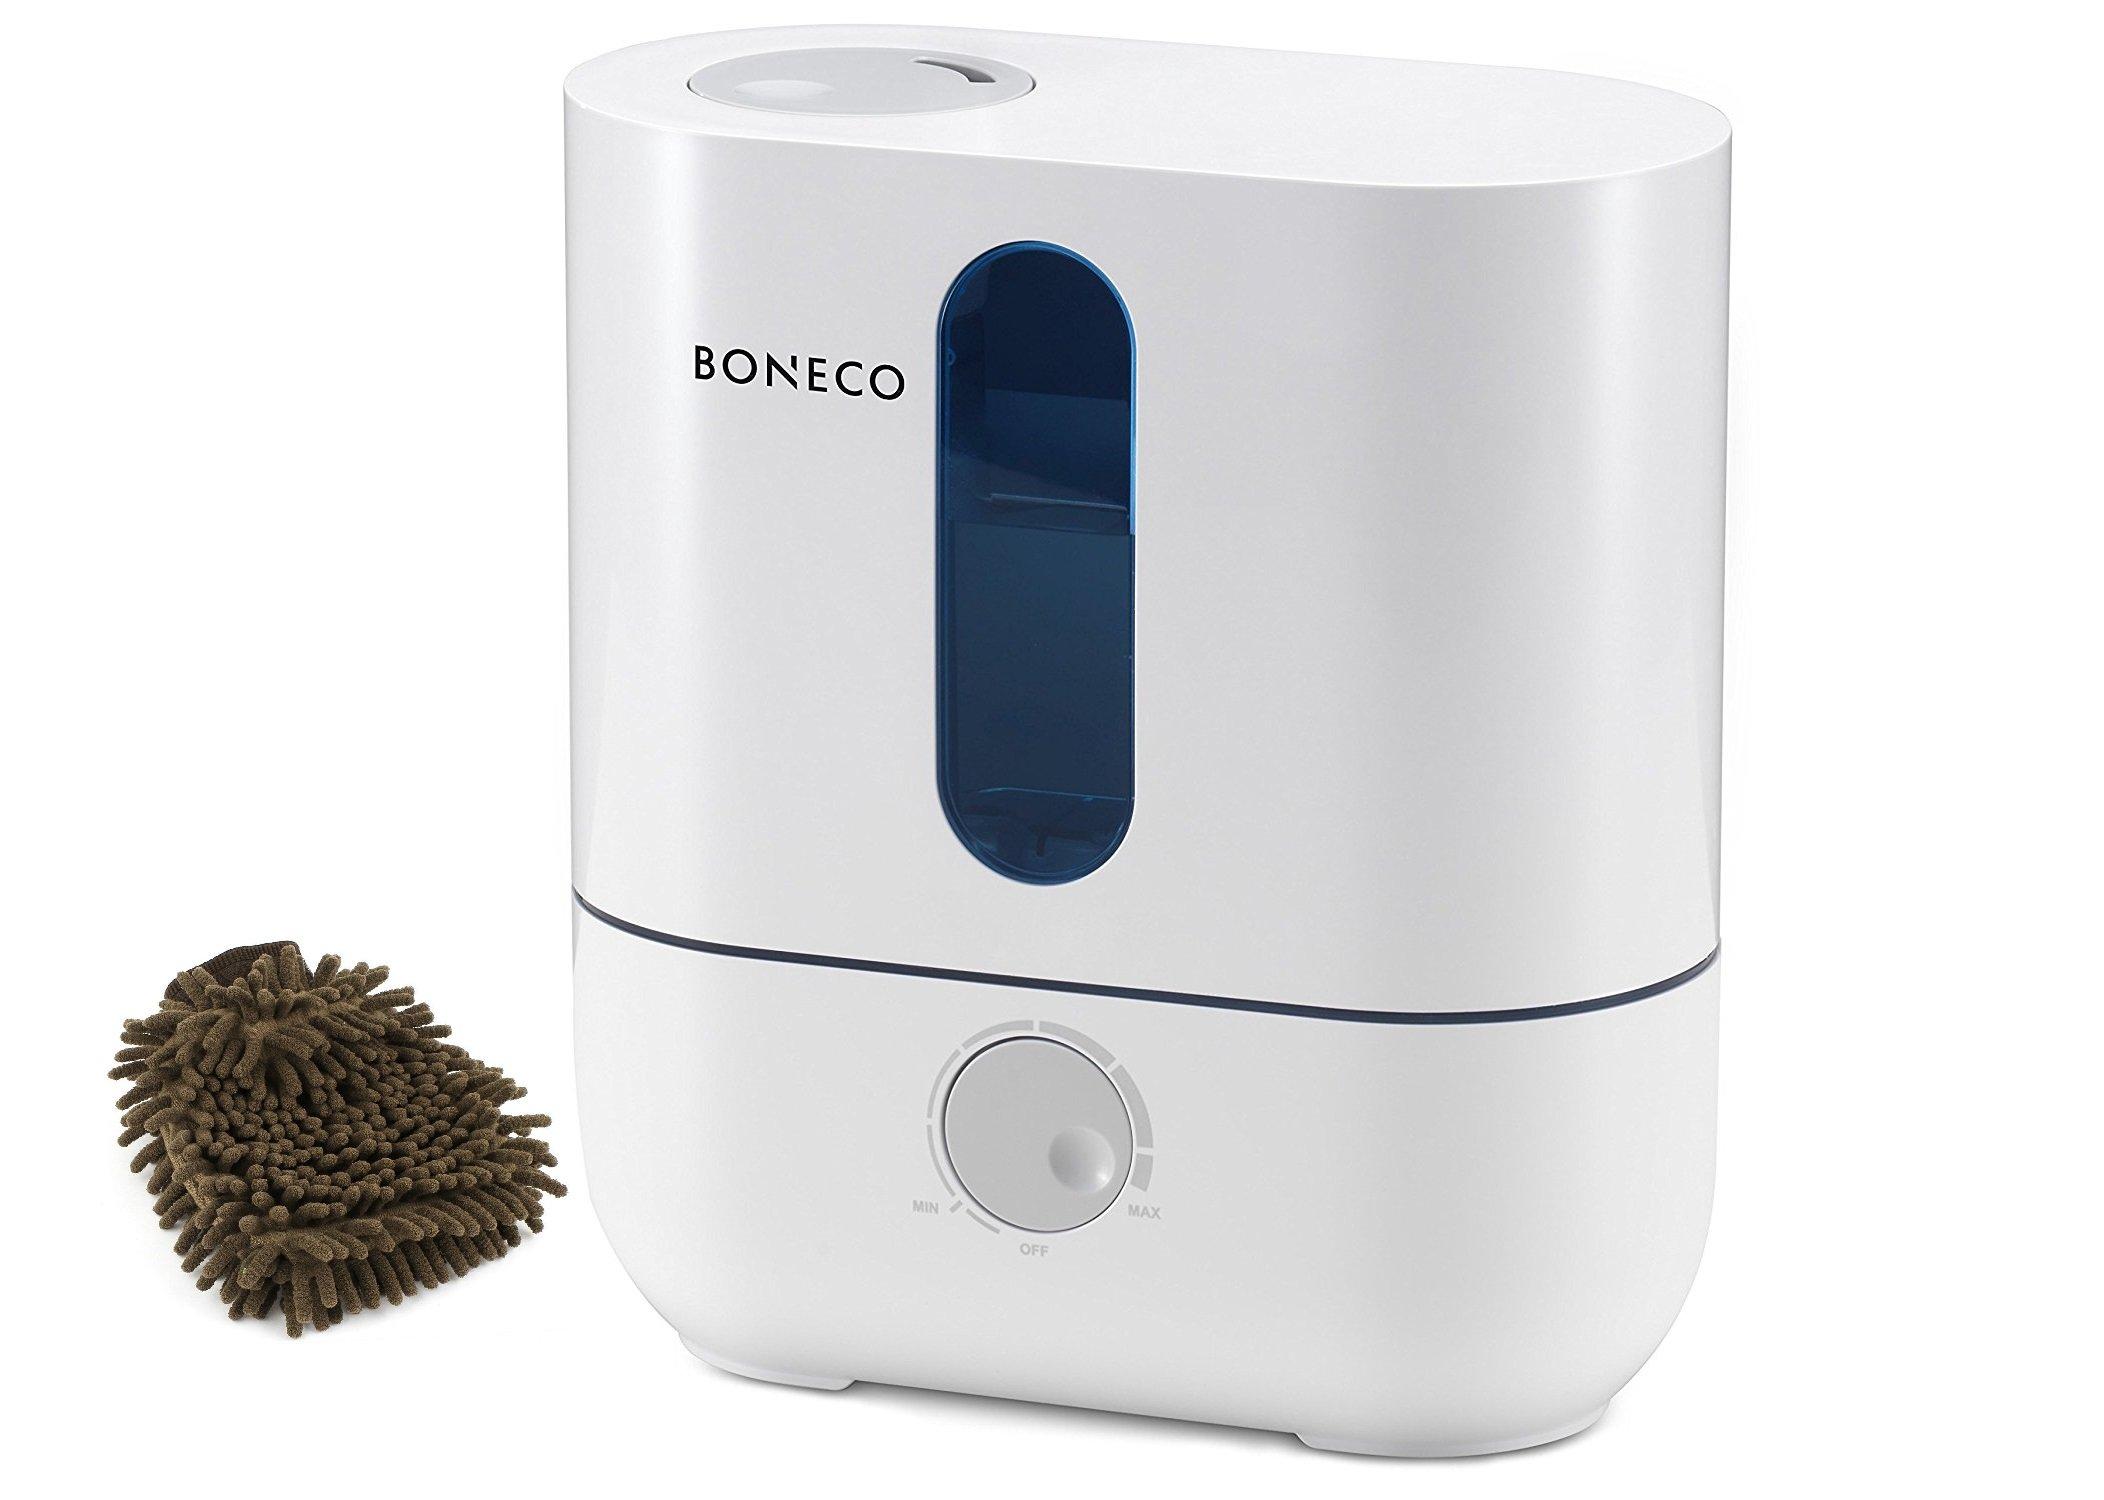 Boneco U200 Ultrasonic Humidifier, Cool Mist (Complete Set) w/ Bonus: Premium Microfiber Cleaner Bundle